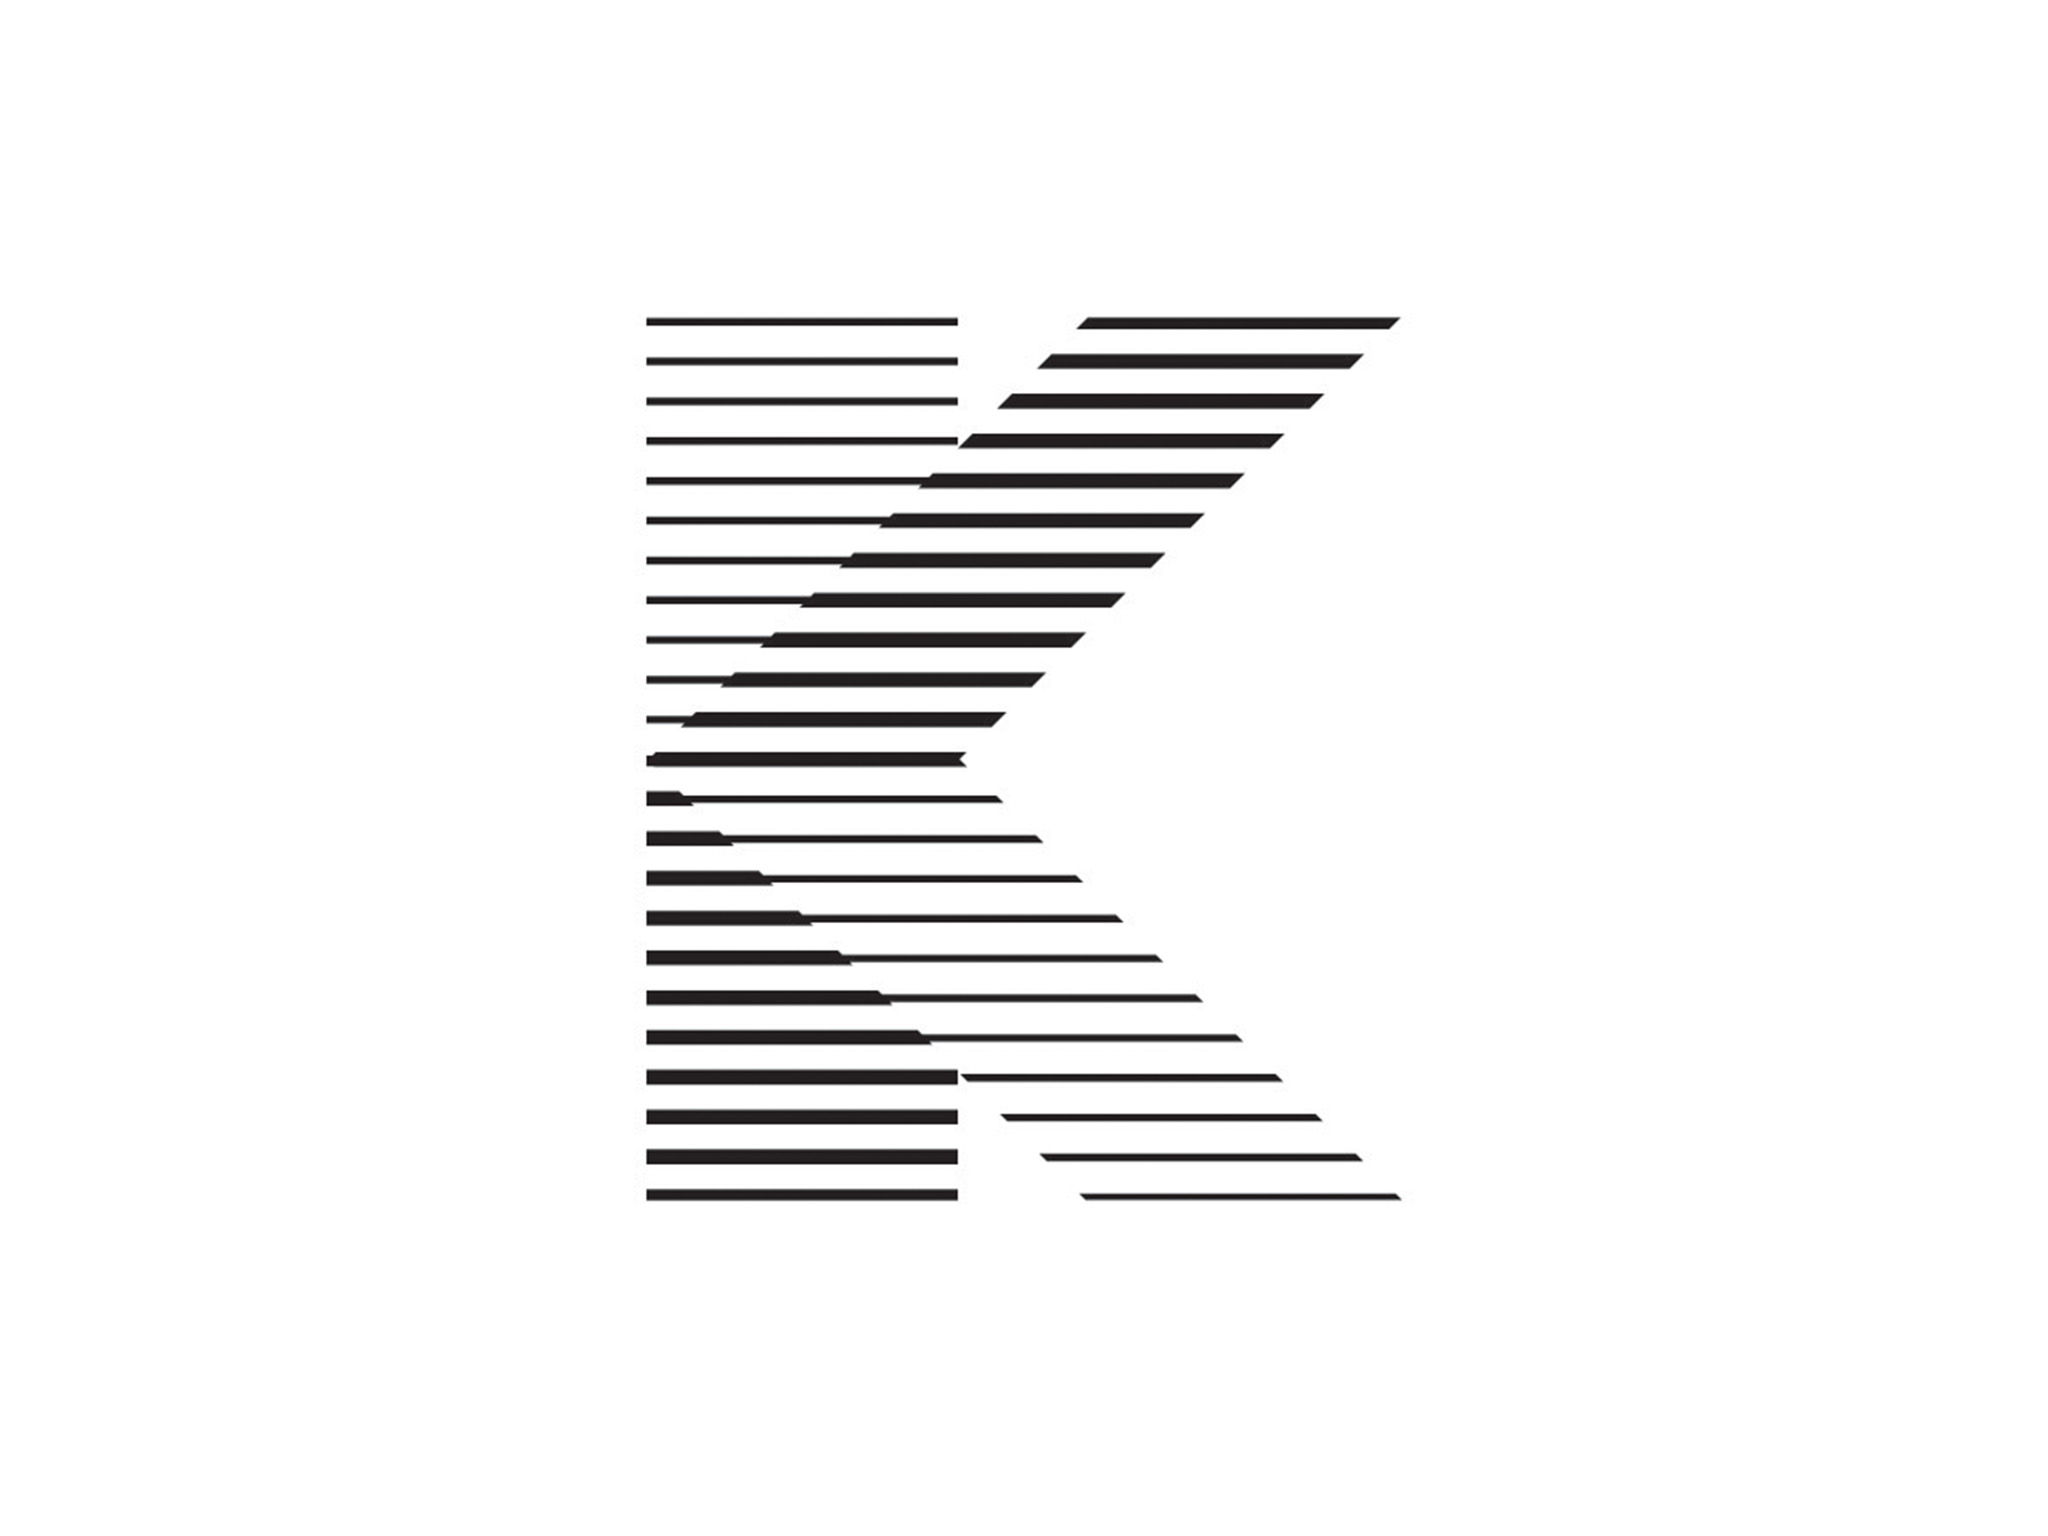 apex_letters_horizontal_large_0029_2_final_alphabet coasters-11.jpg